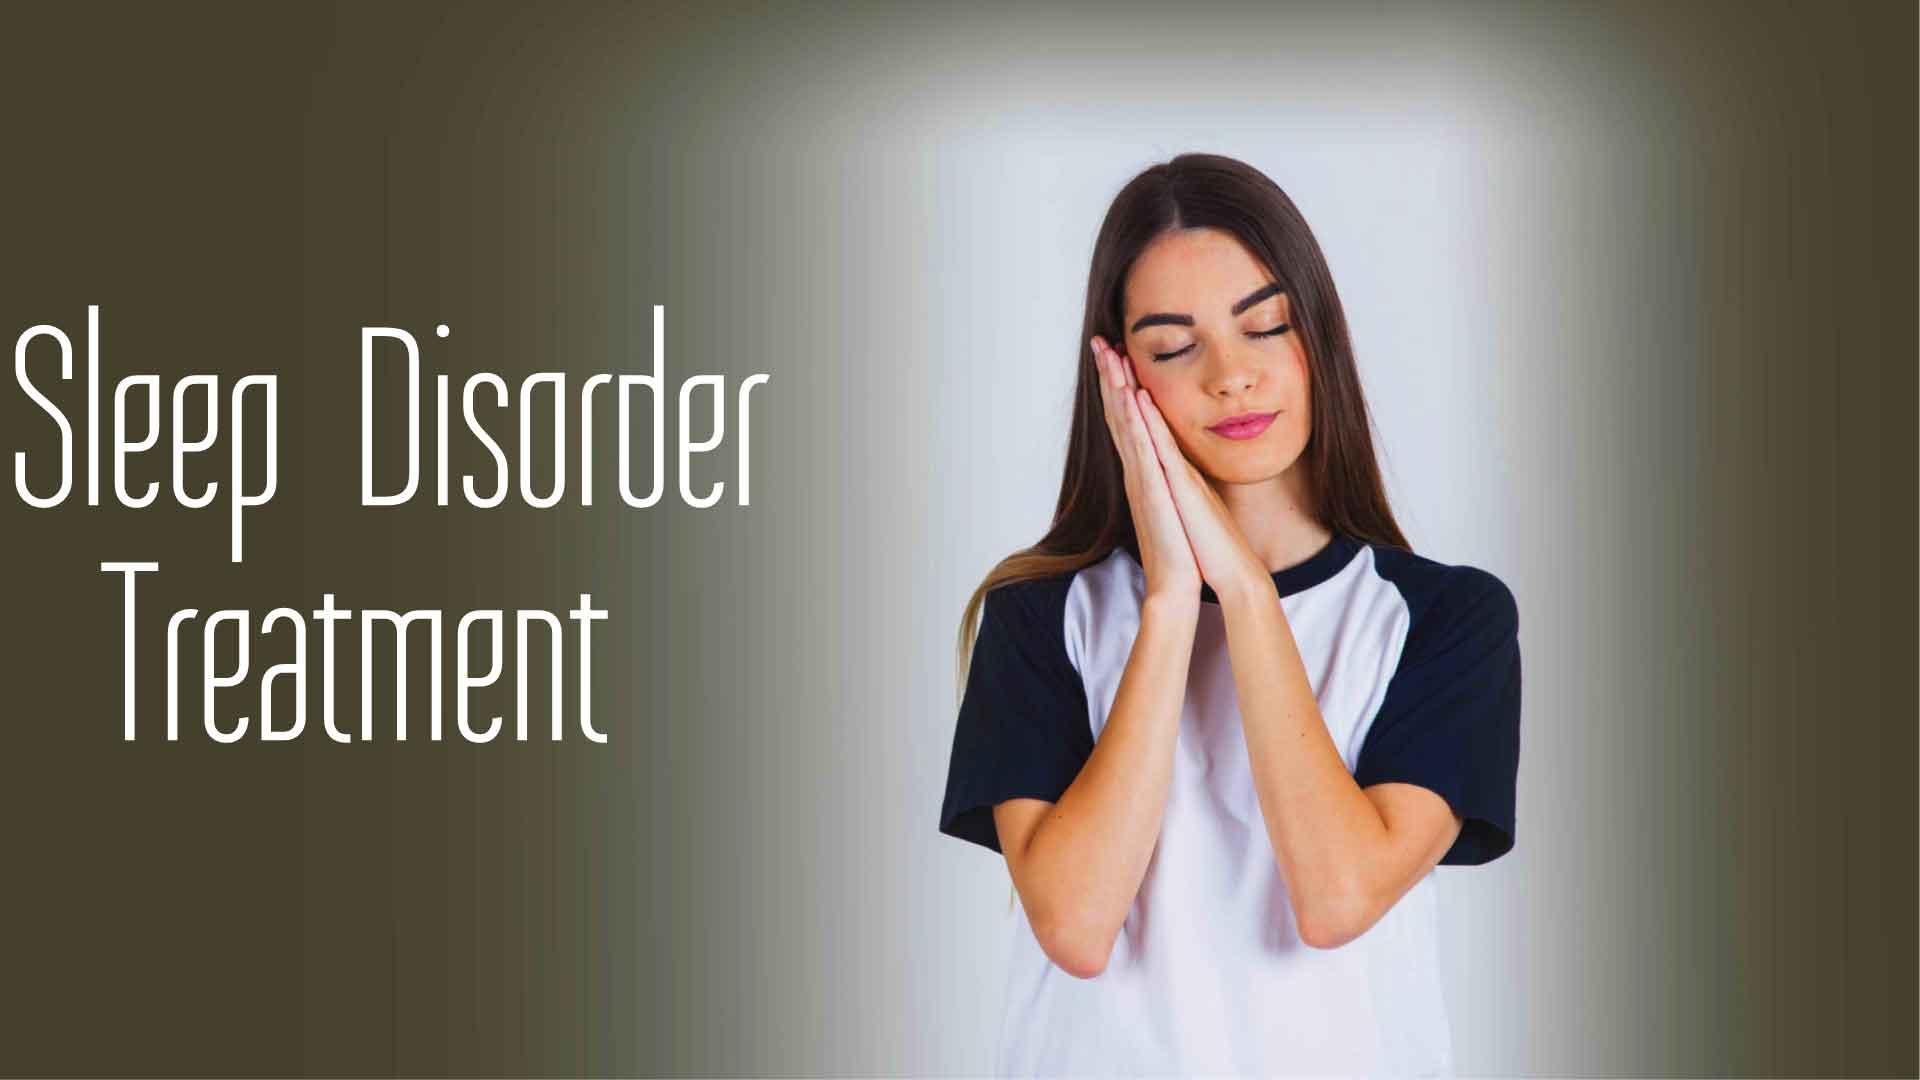 Sleep Disorder Treatment in Nagpur - Sleep Disorder | Dr ...